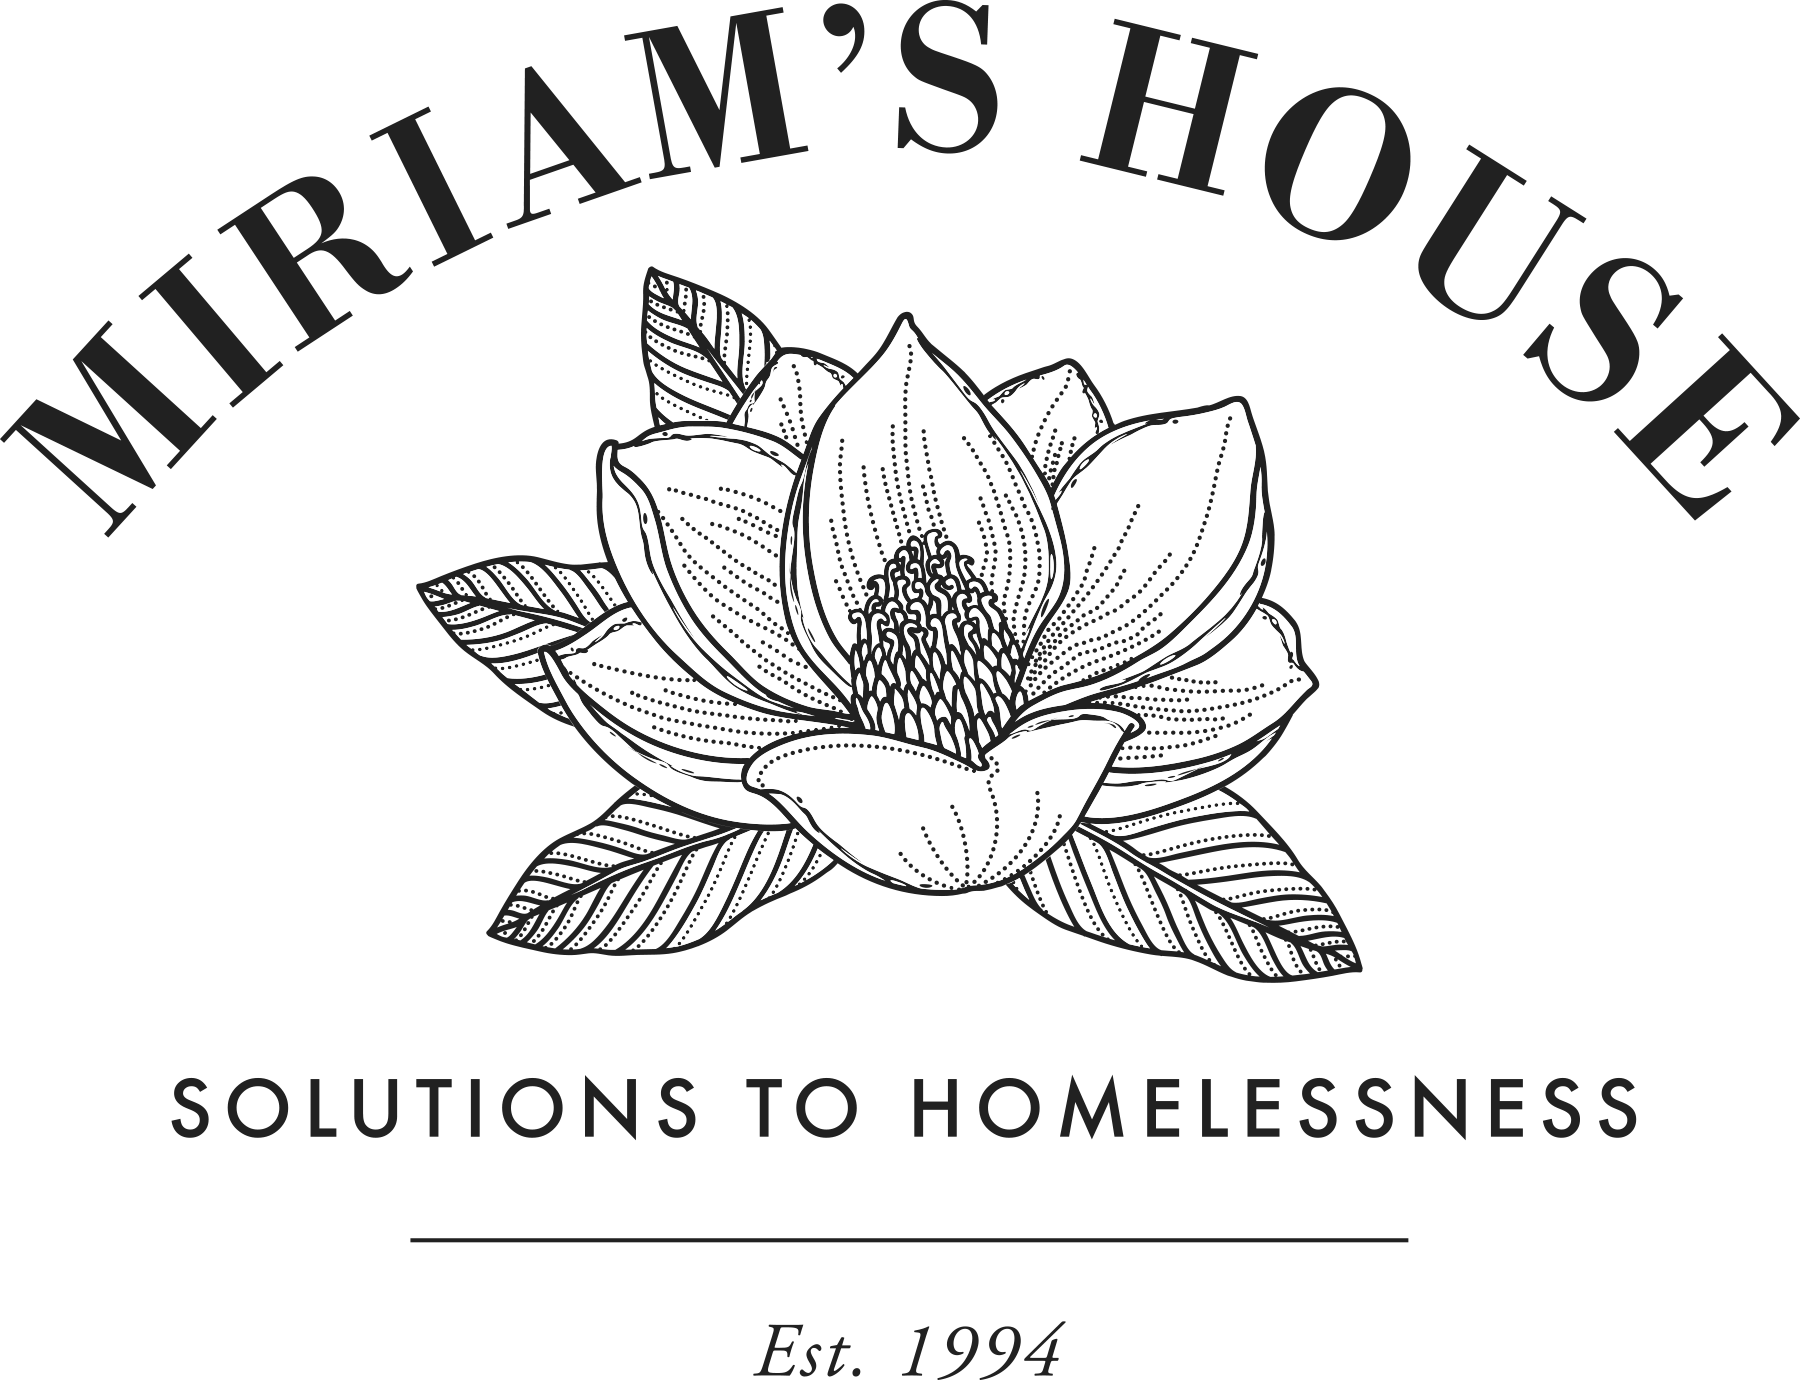 miriams-house-logo-seal-light-bg.png